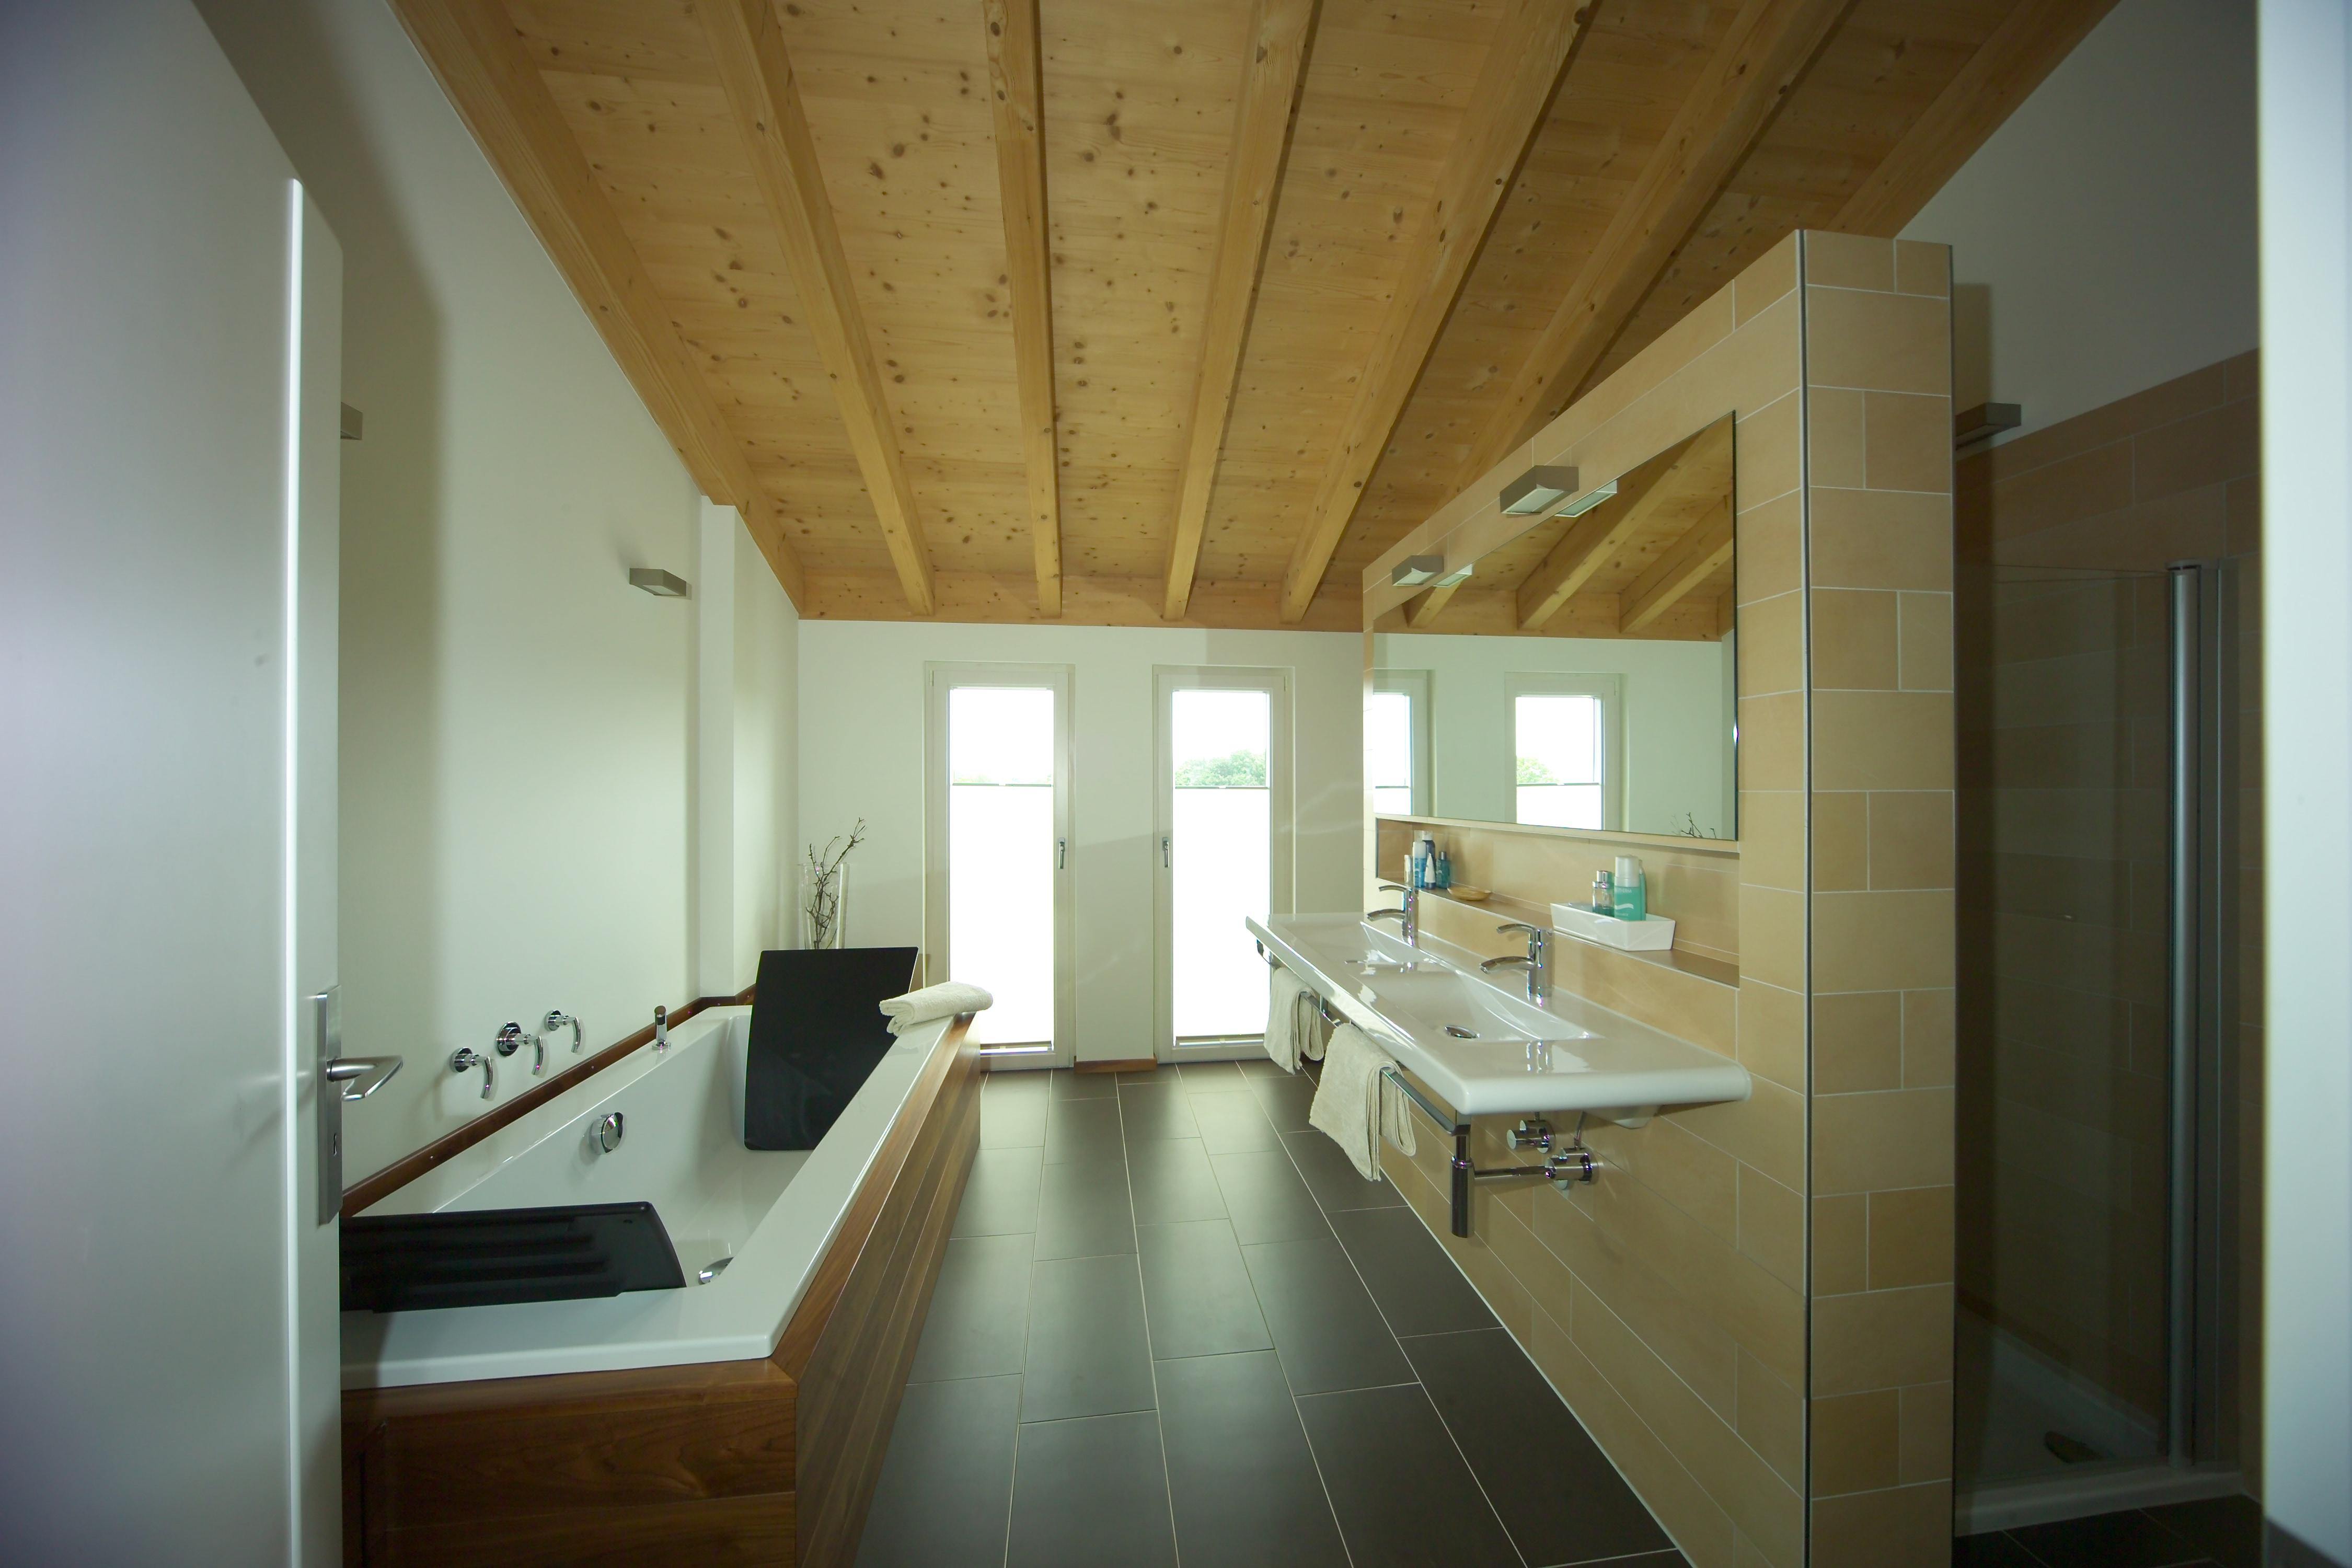 referenzobjekte ziegler holzbau gmbh. Black Bedroom Furniture Sets. Home Design Ideas